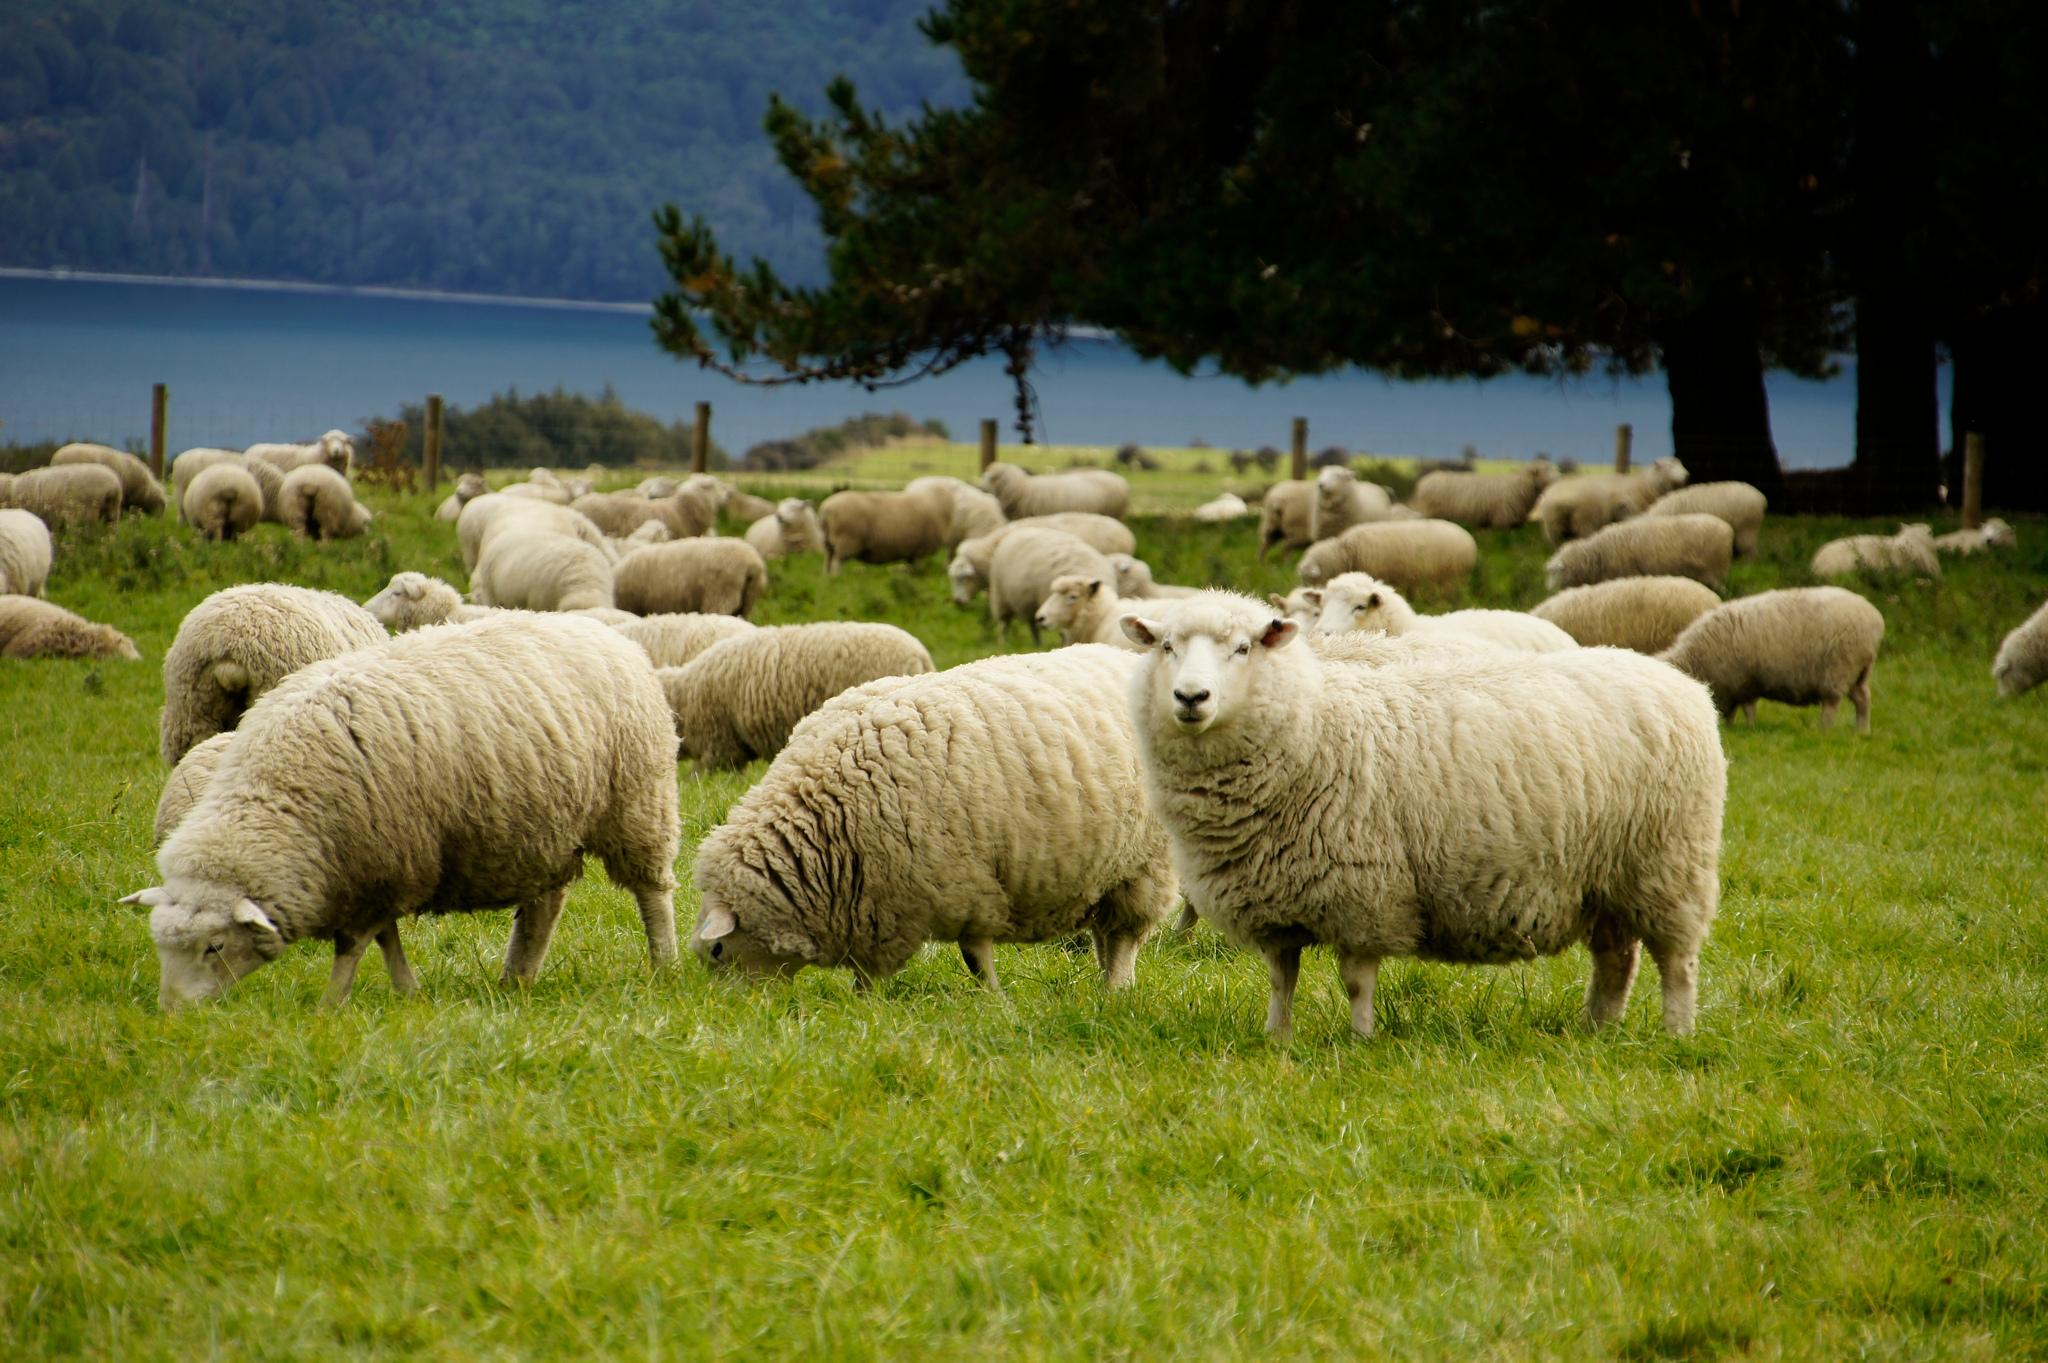 Sheep shagging dating website